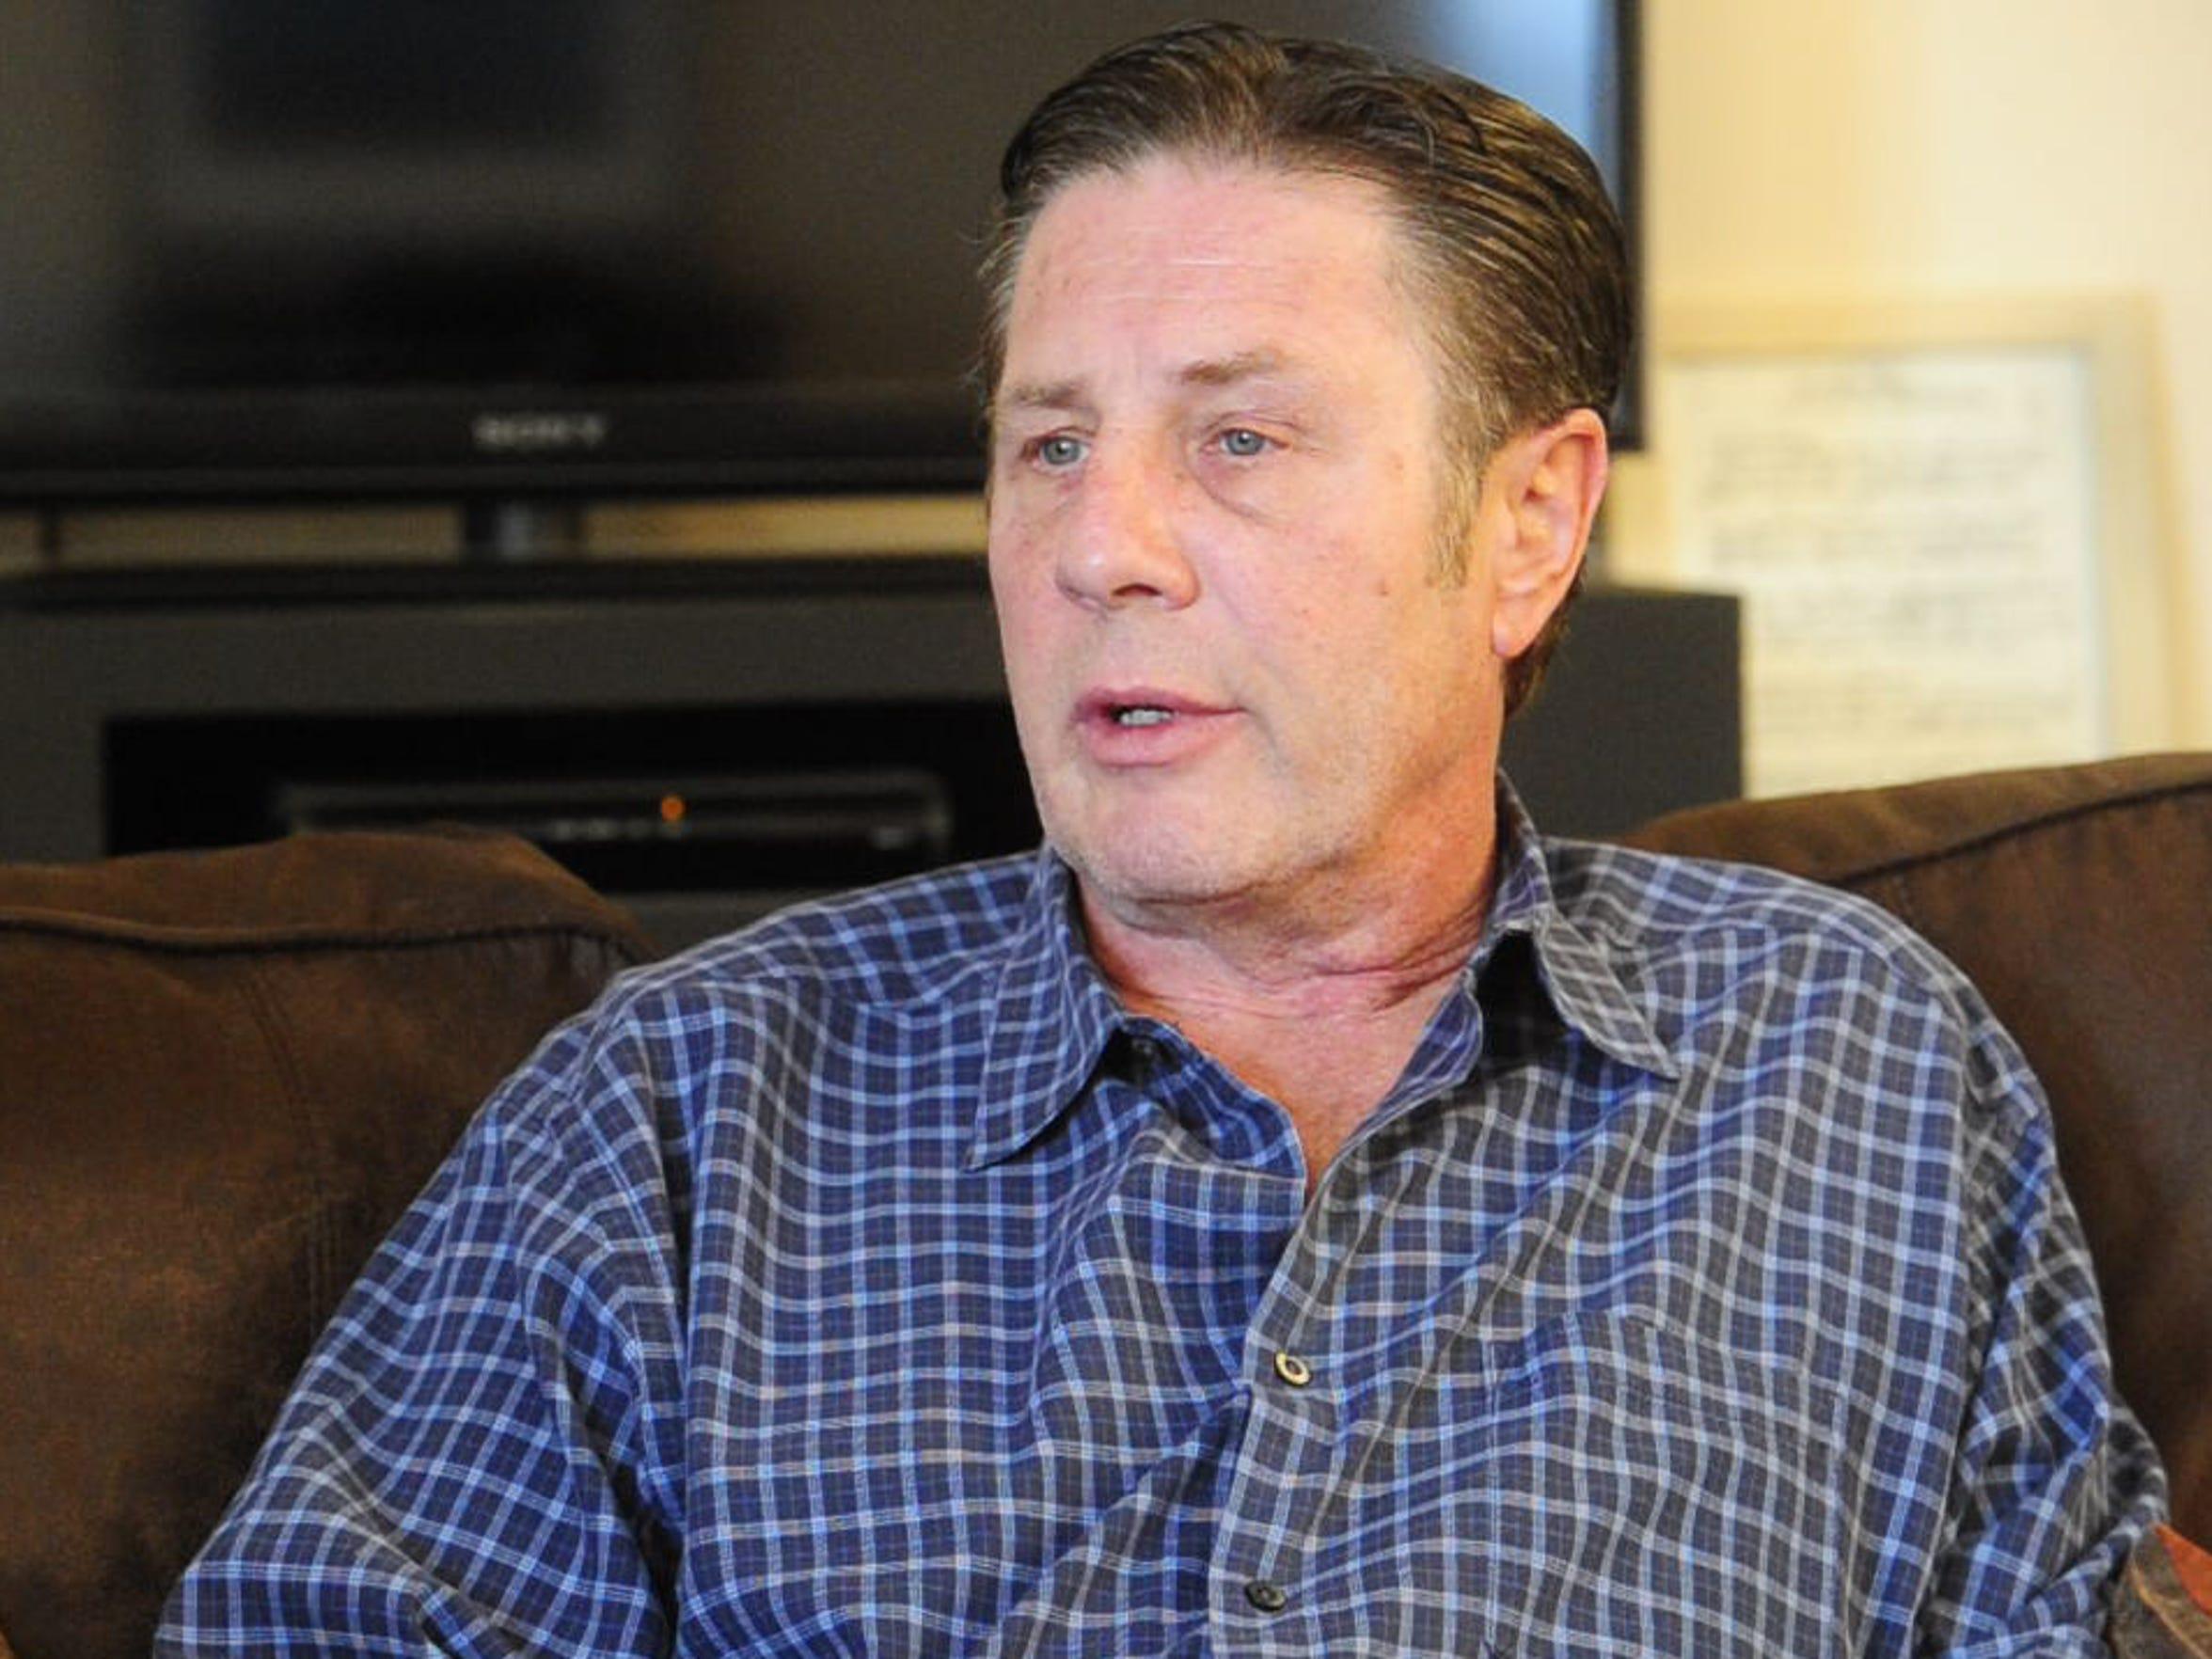 Bart Herbison is executive director of Nashville Songwriters